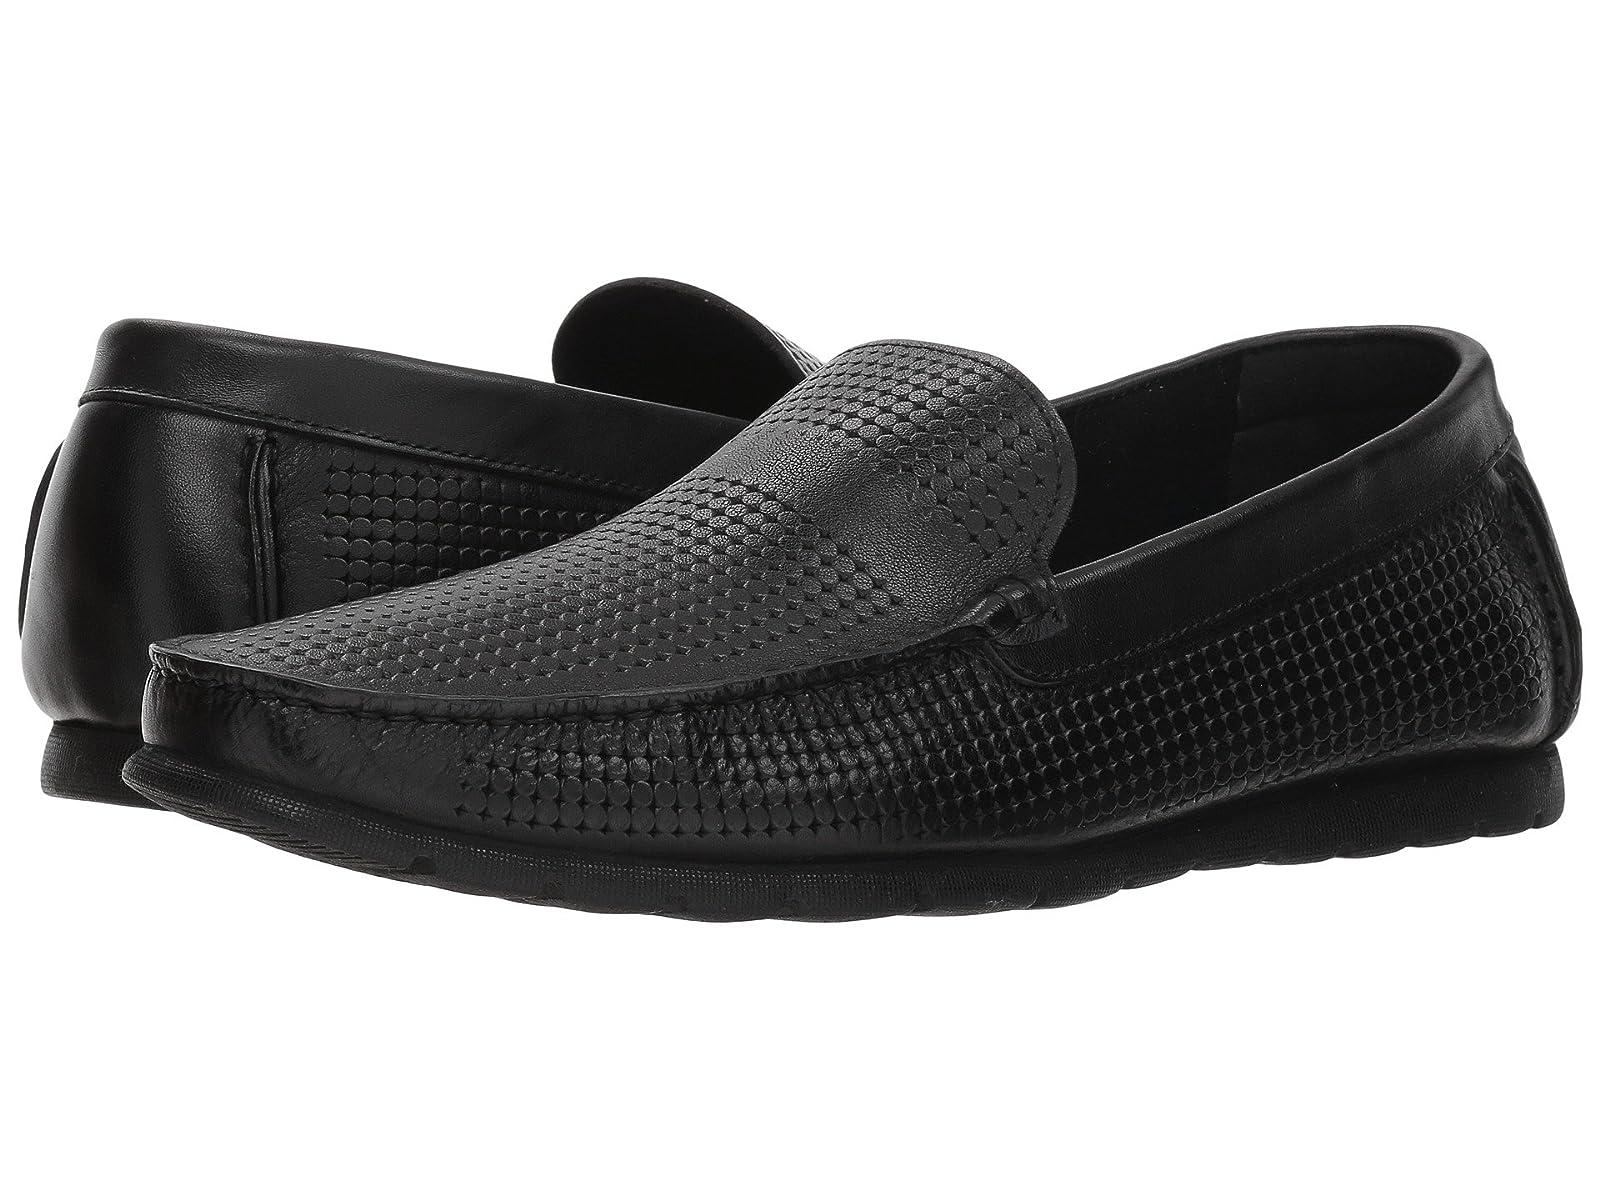 Kenneth Cole Reaction Hendrix Slip-OnAtmospheric grades have affordable shoes